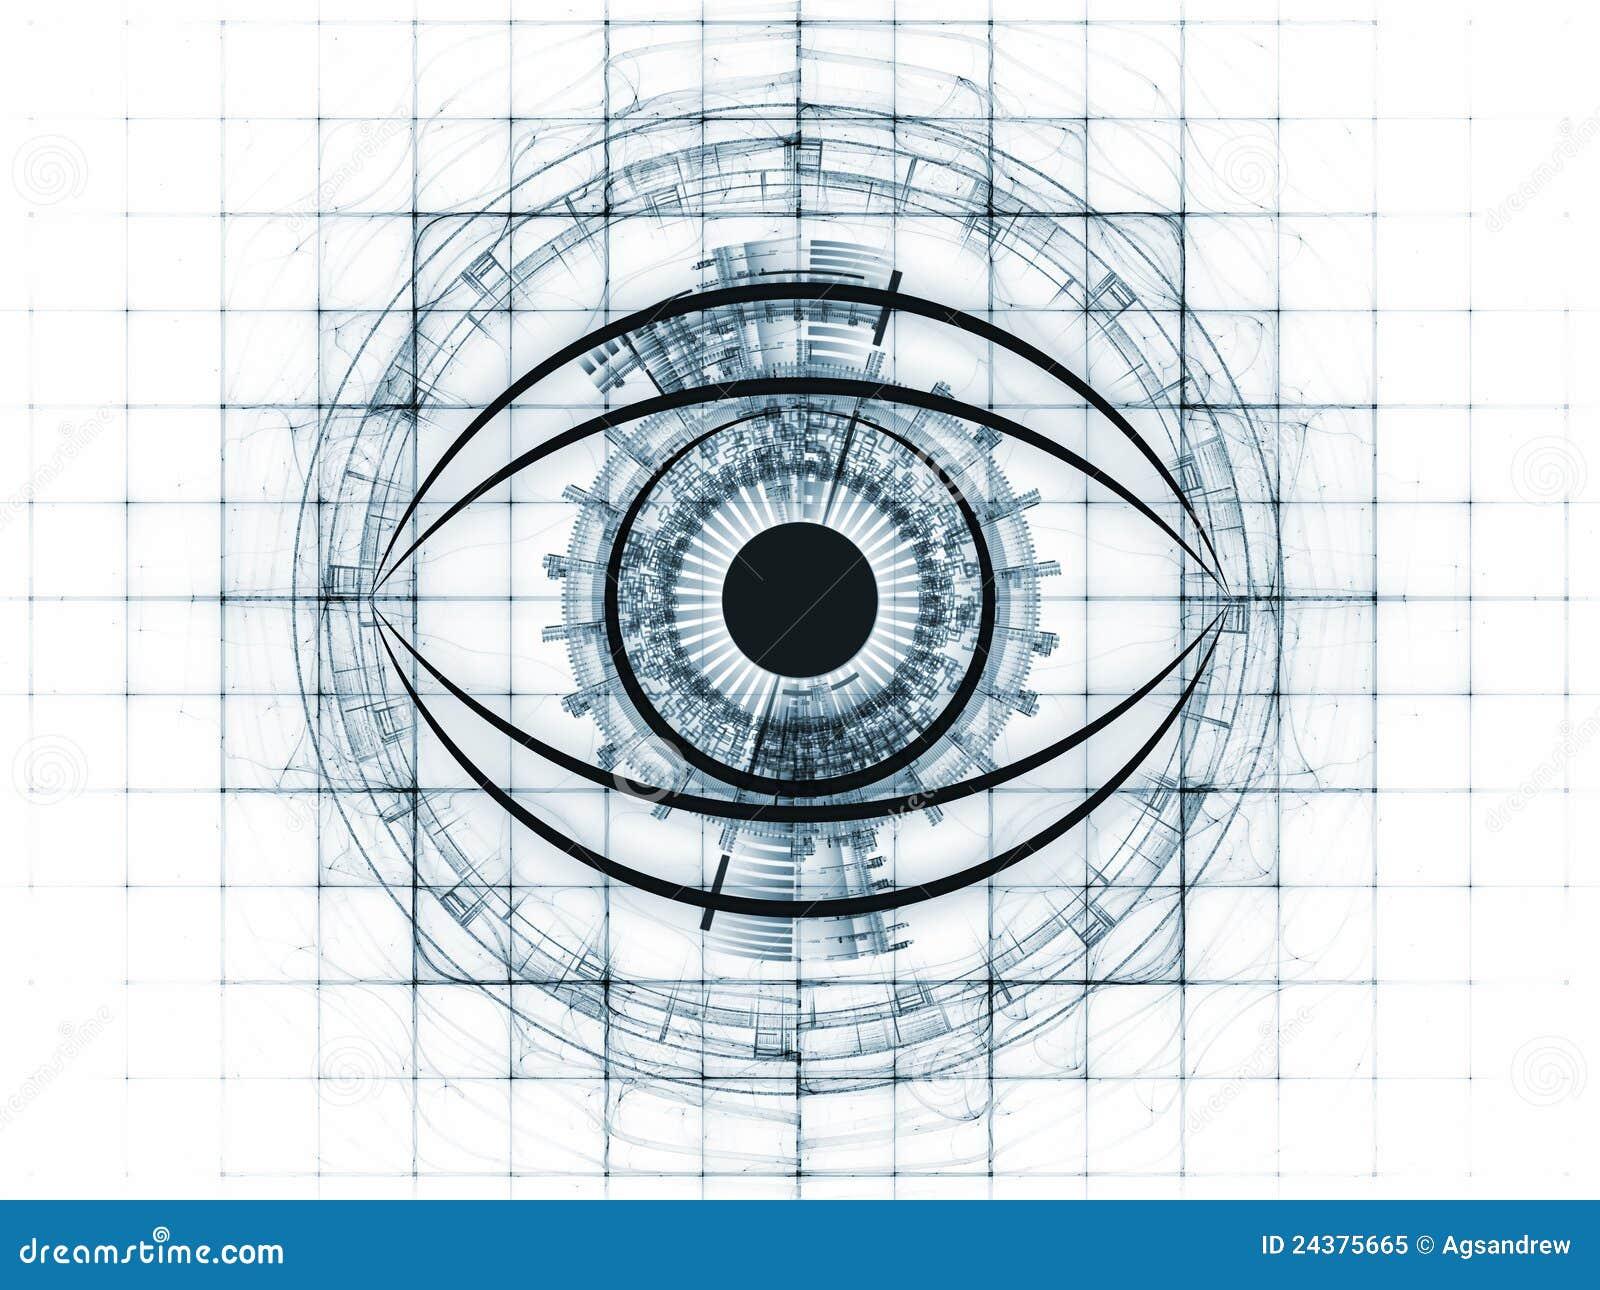 Sight of technology